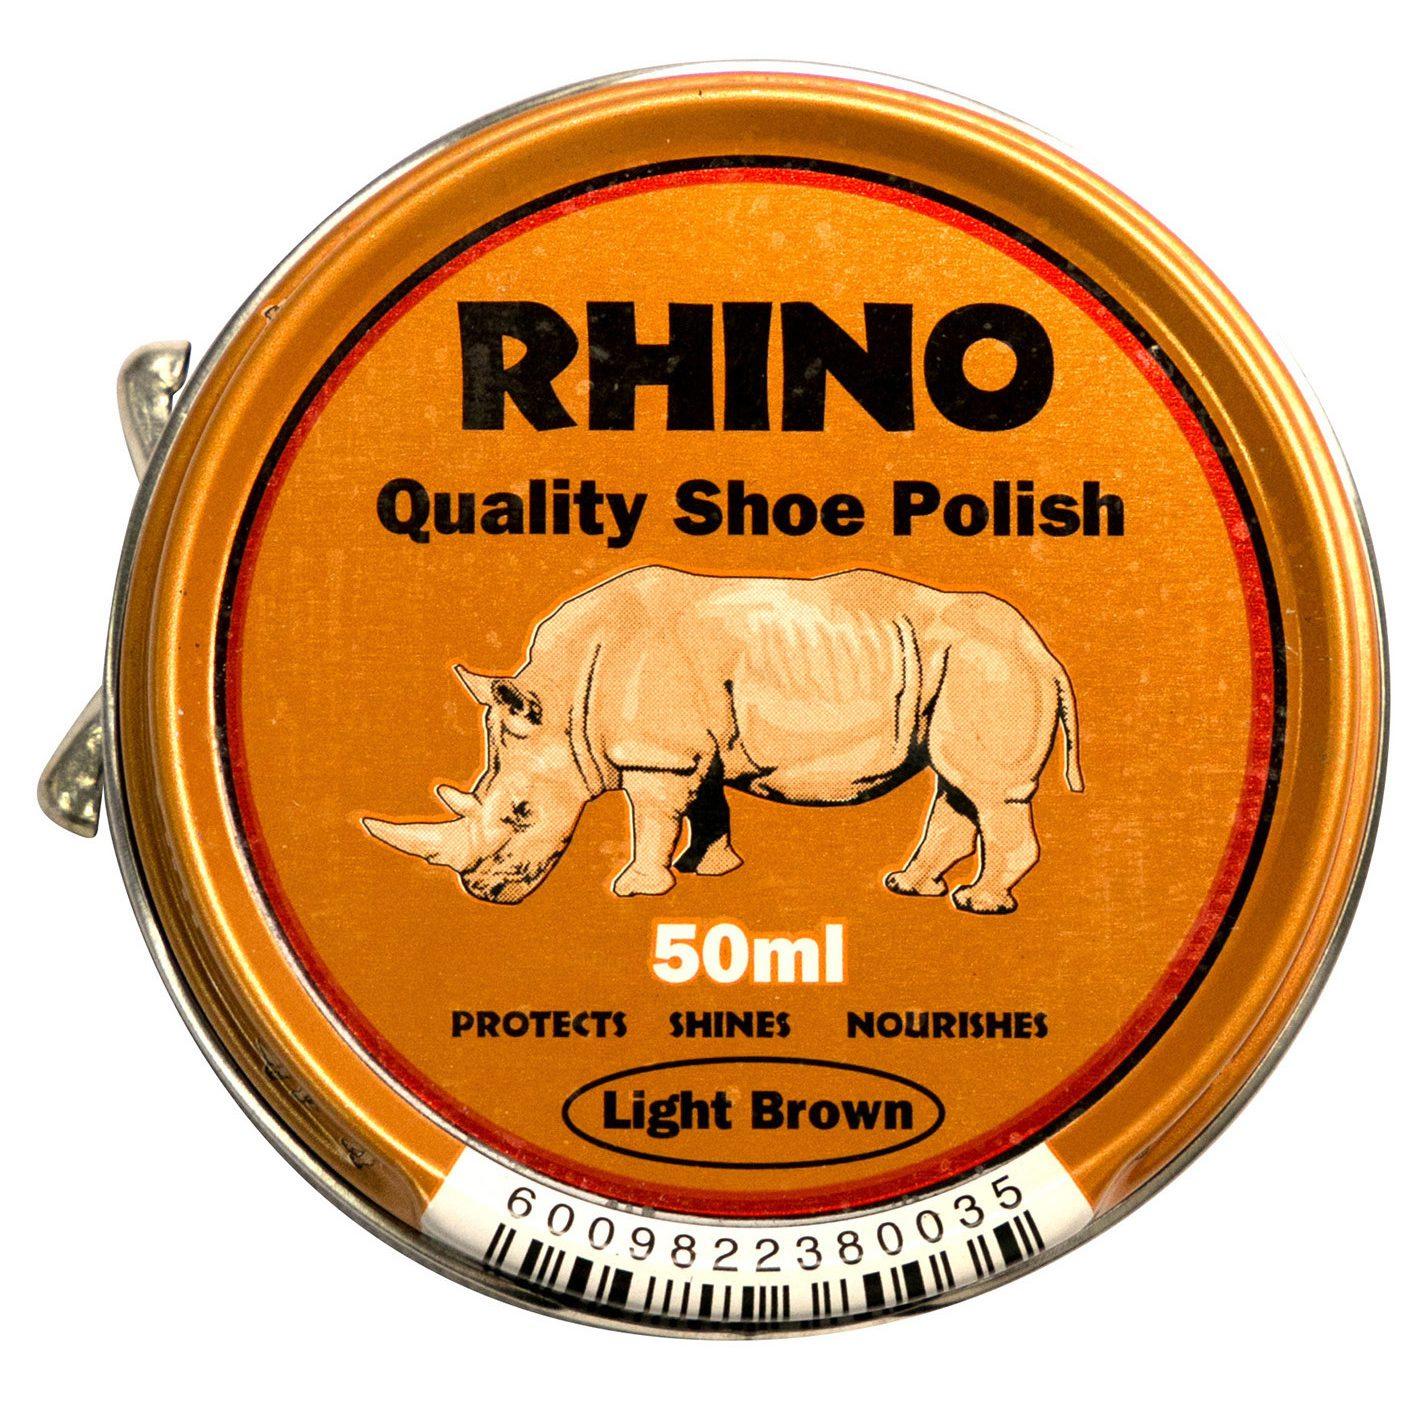 Rhino Shoe Polish Light Brown 50ml